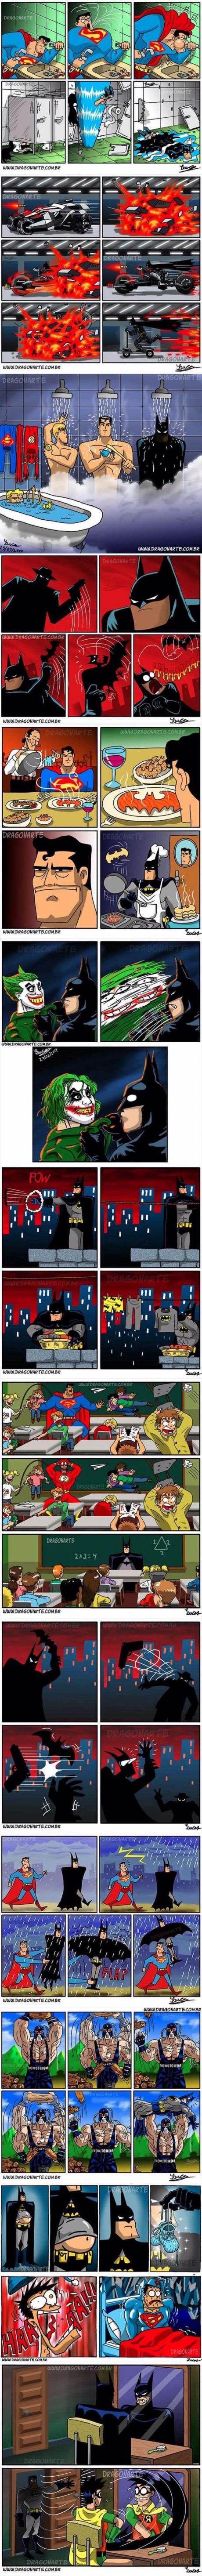 Batverse!